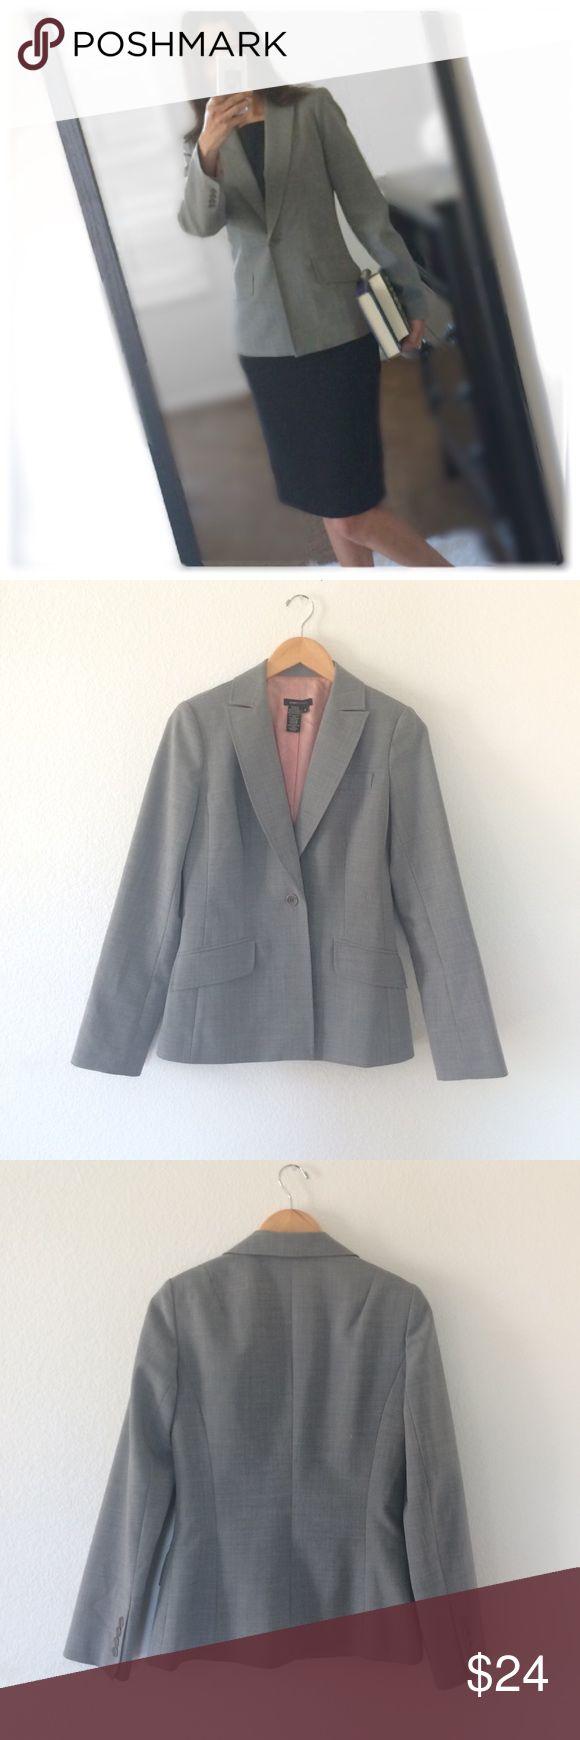 "Gray Blazer Excellent used condition gray blazer by BCBG MAXAZRIA . Size 4. dimensions:bust:17.5"",waist:15.5"", length from shoulders: 24.5"", sleeve: 23.5"". BCBGMaxAzria Jackets & Coats Blazers"